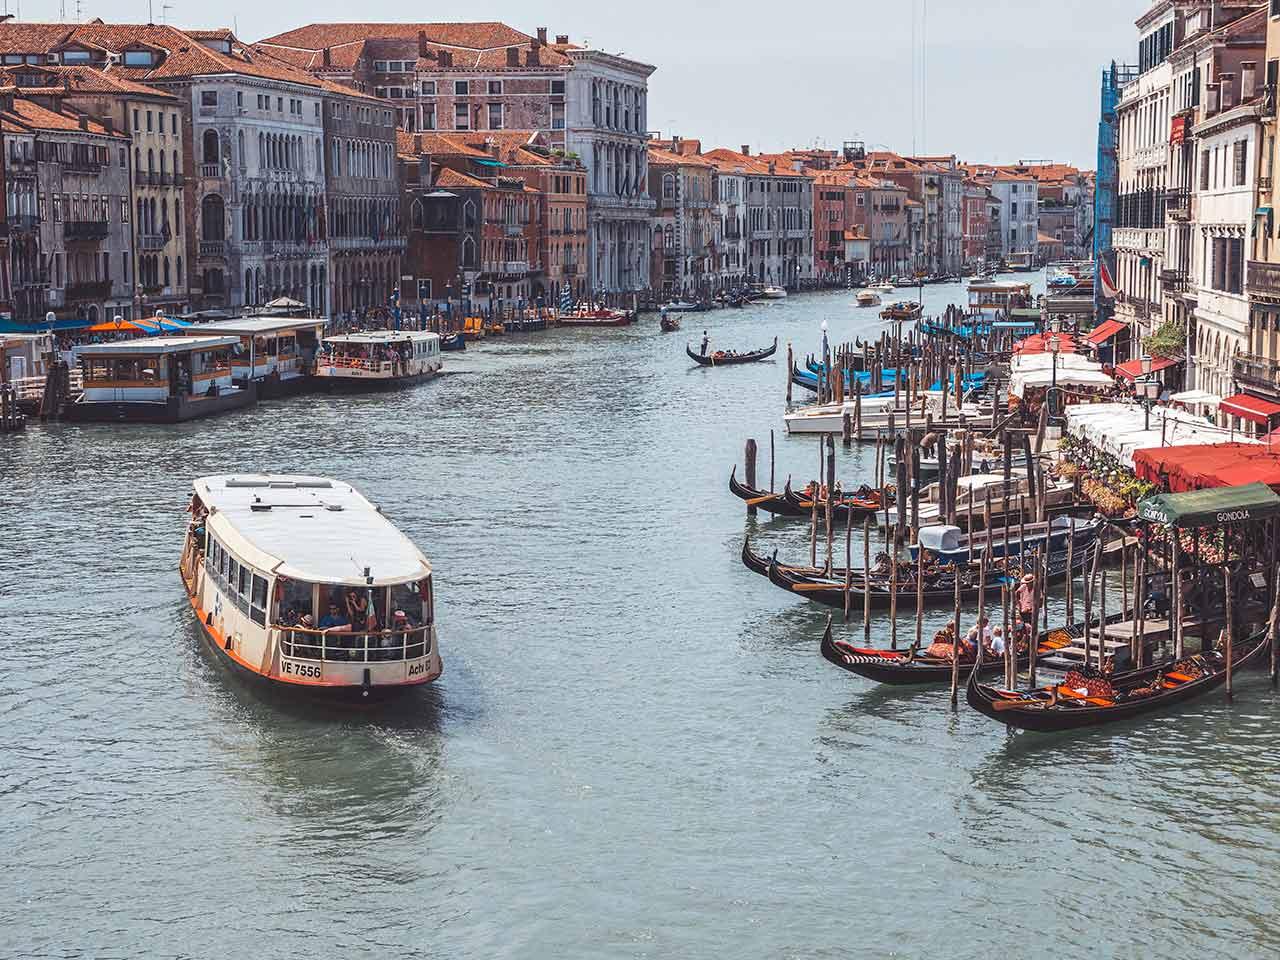 Wassertaxi in Venedig - Vaporetto